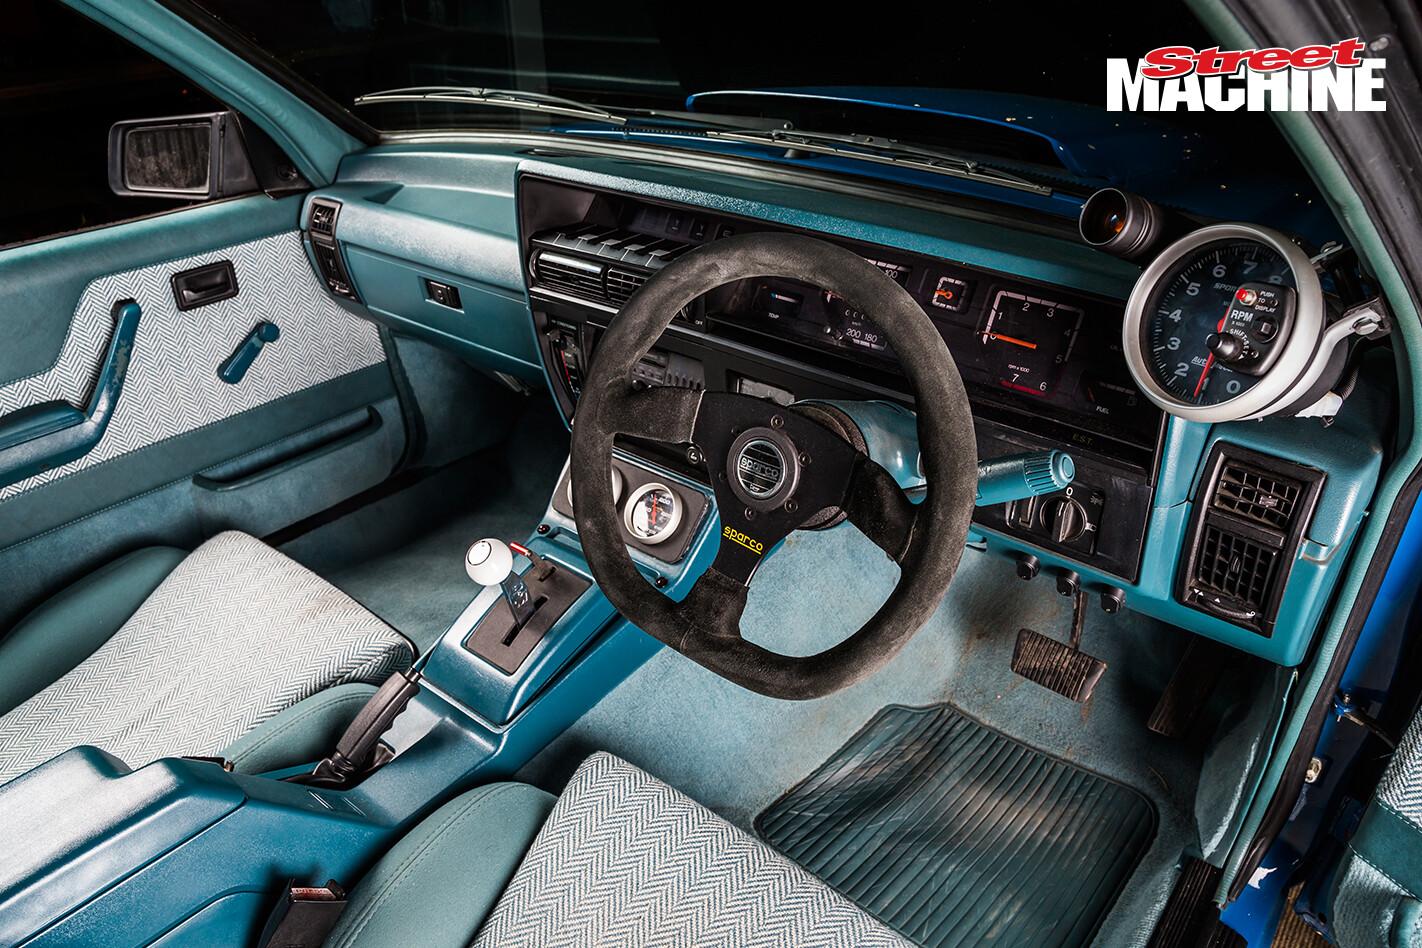 Holden VK Commodore HDT Brock Blue Meanie LSA 10